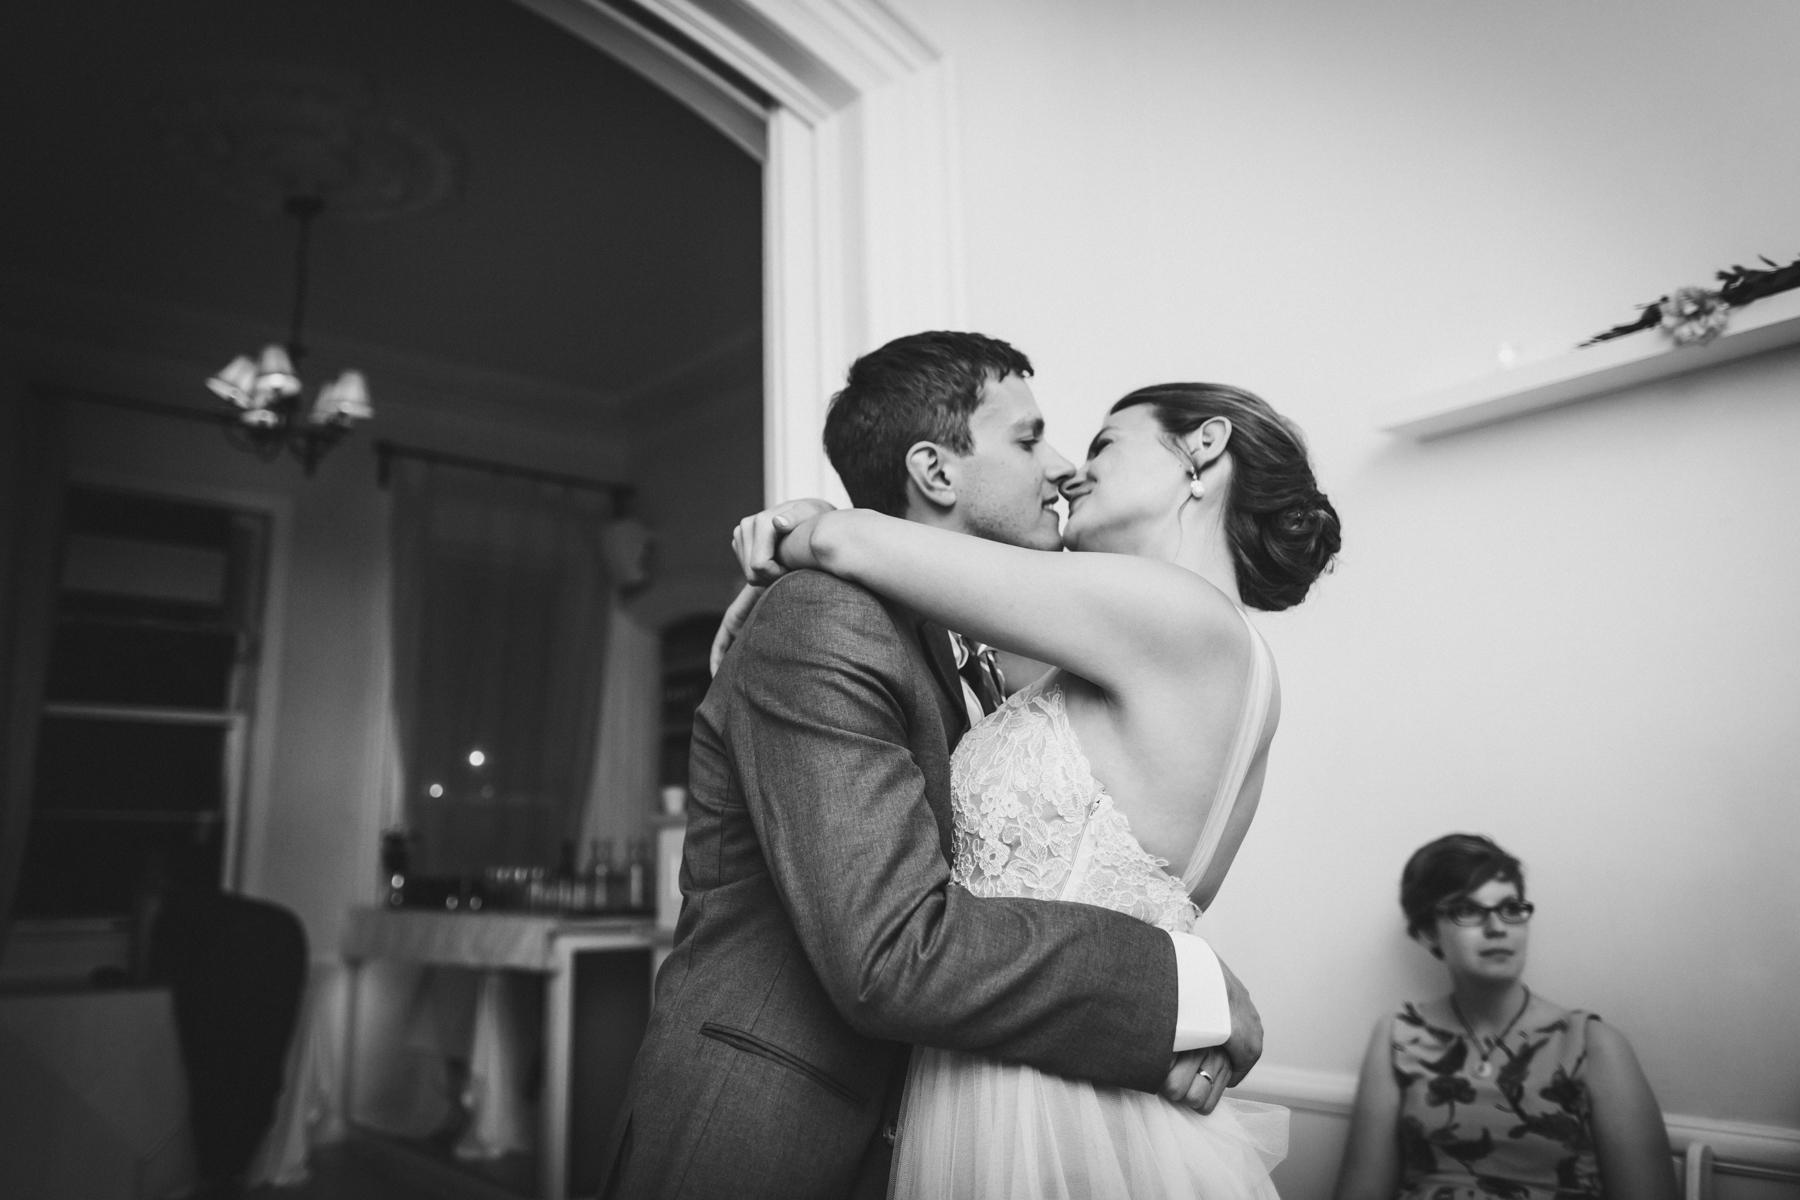 ICI-Restaurant-Fort-Greene-Brooklyn-Intimate-Documentary-Wedding-Photography-Elvira-Kalviste-103.jpg